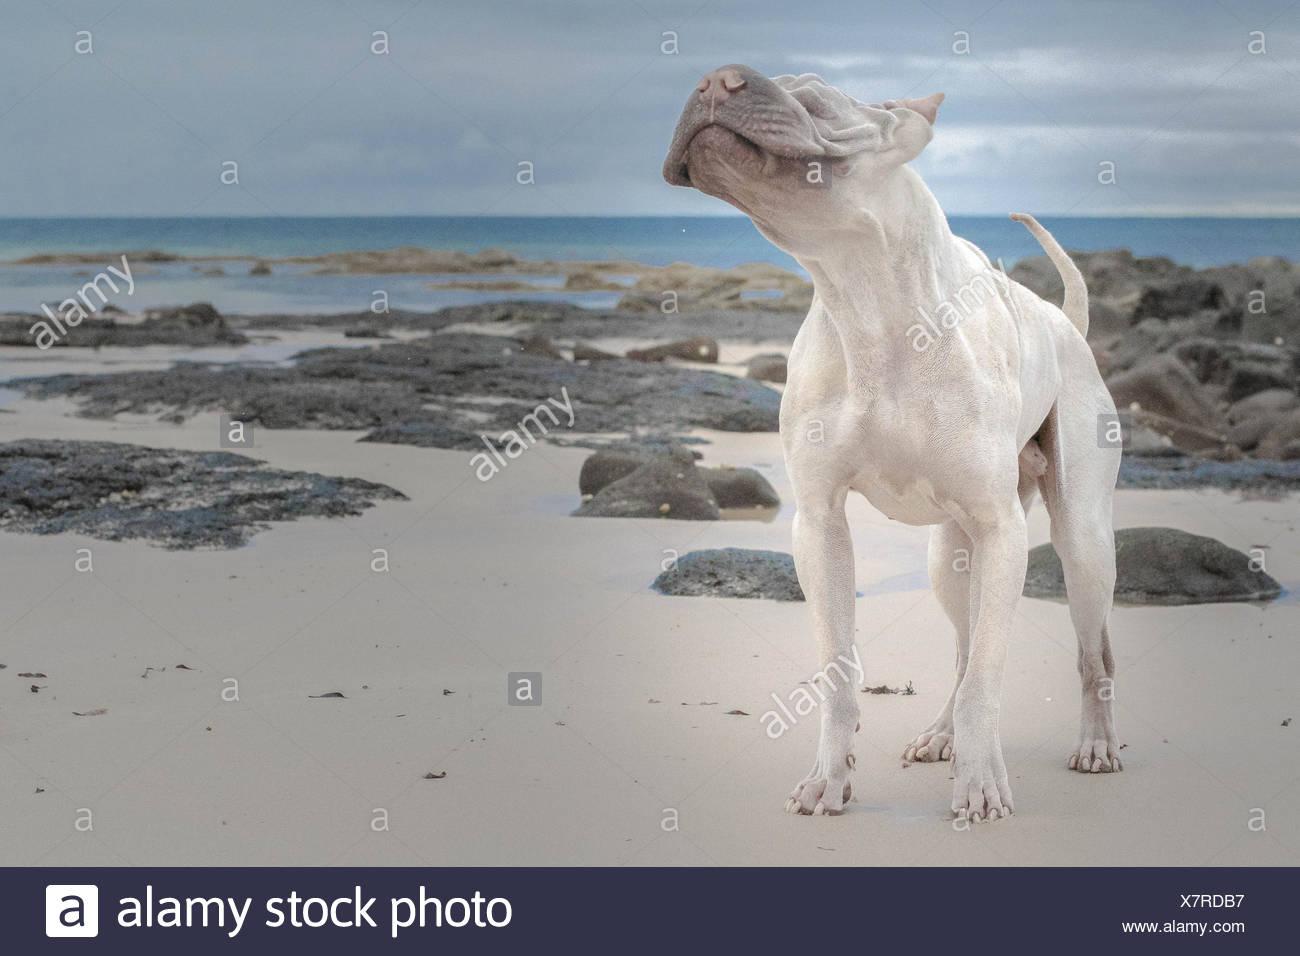 Haarlose Shair-pei stehen am Strand Stockbild